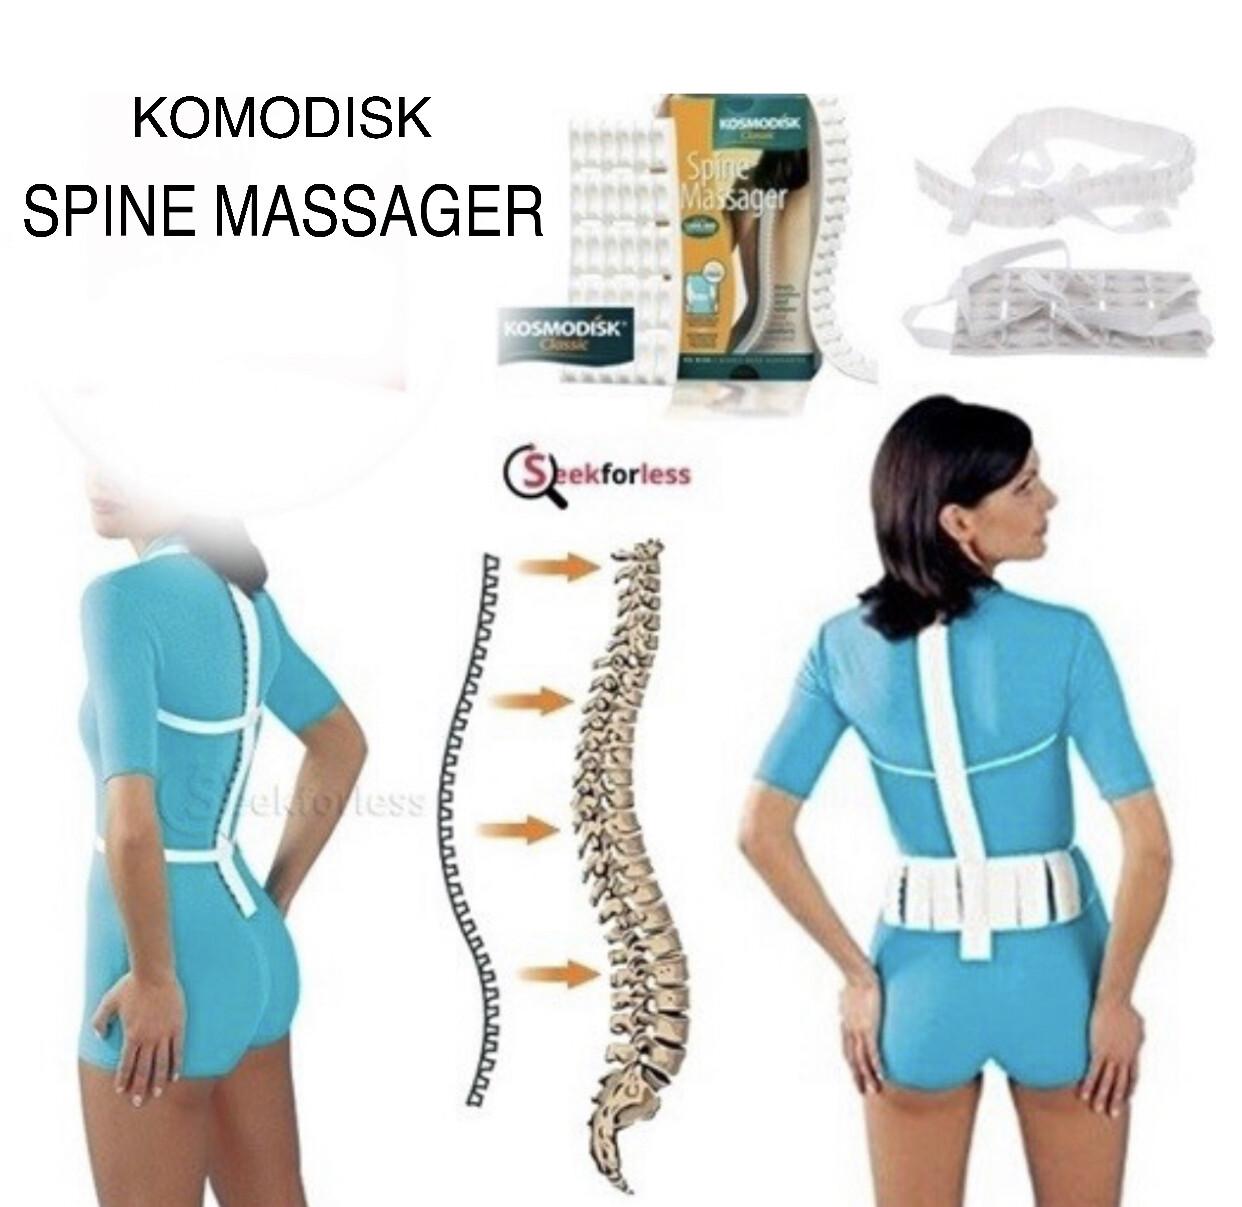 Spine Massager